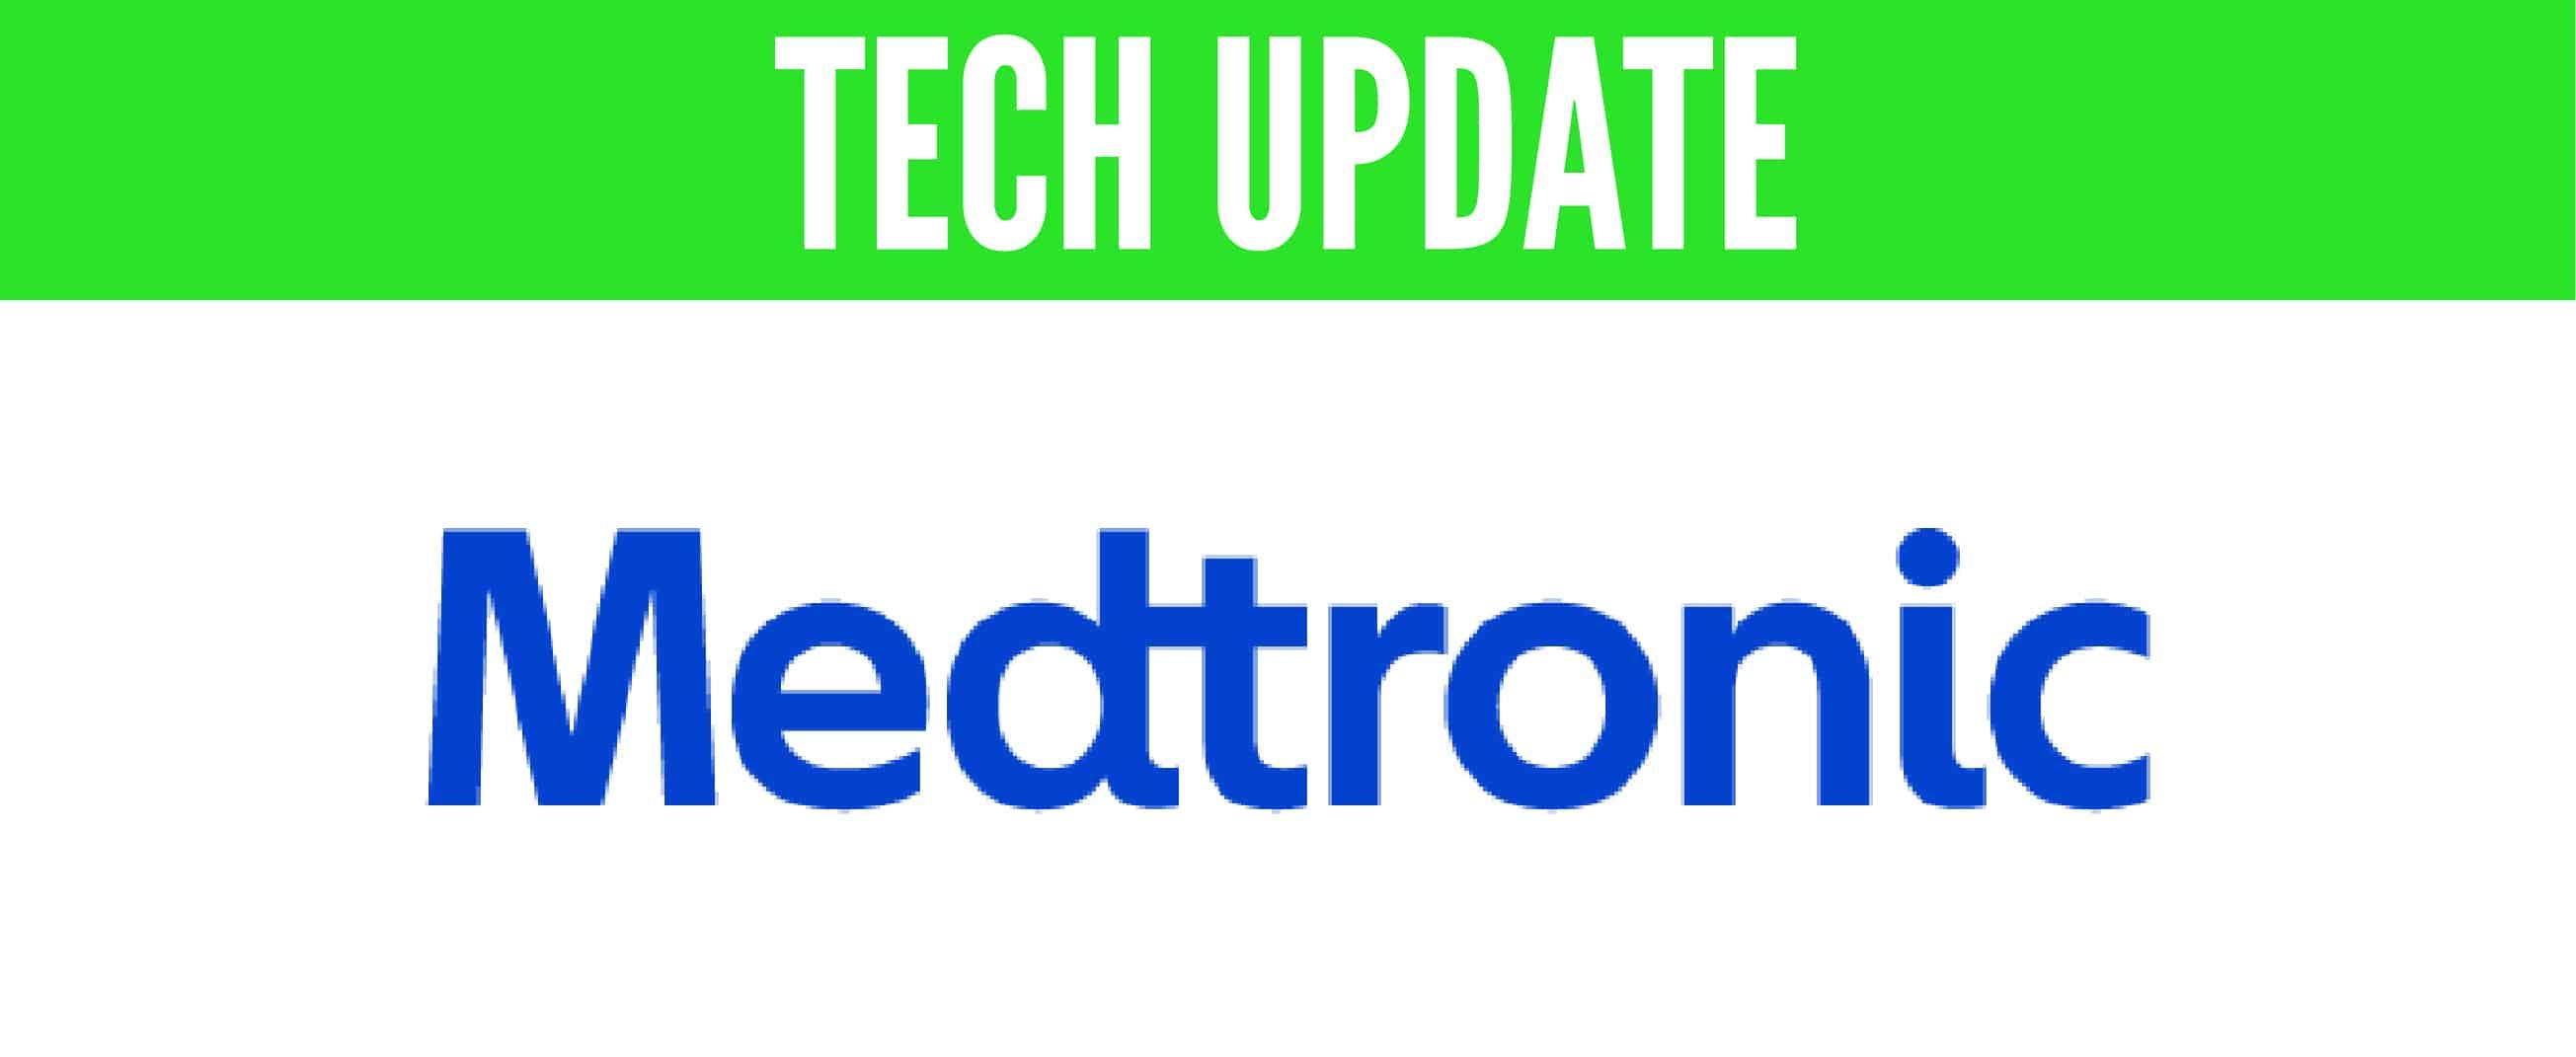 Tech Update: Medtronic (CANADA)